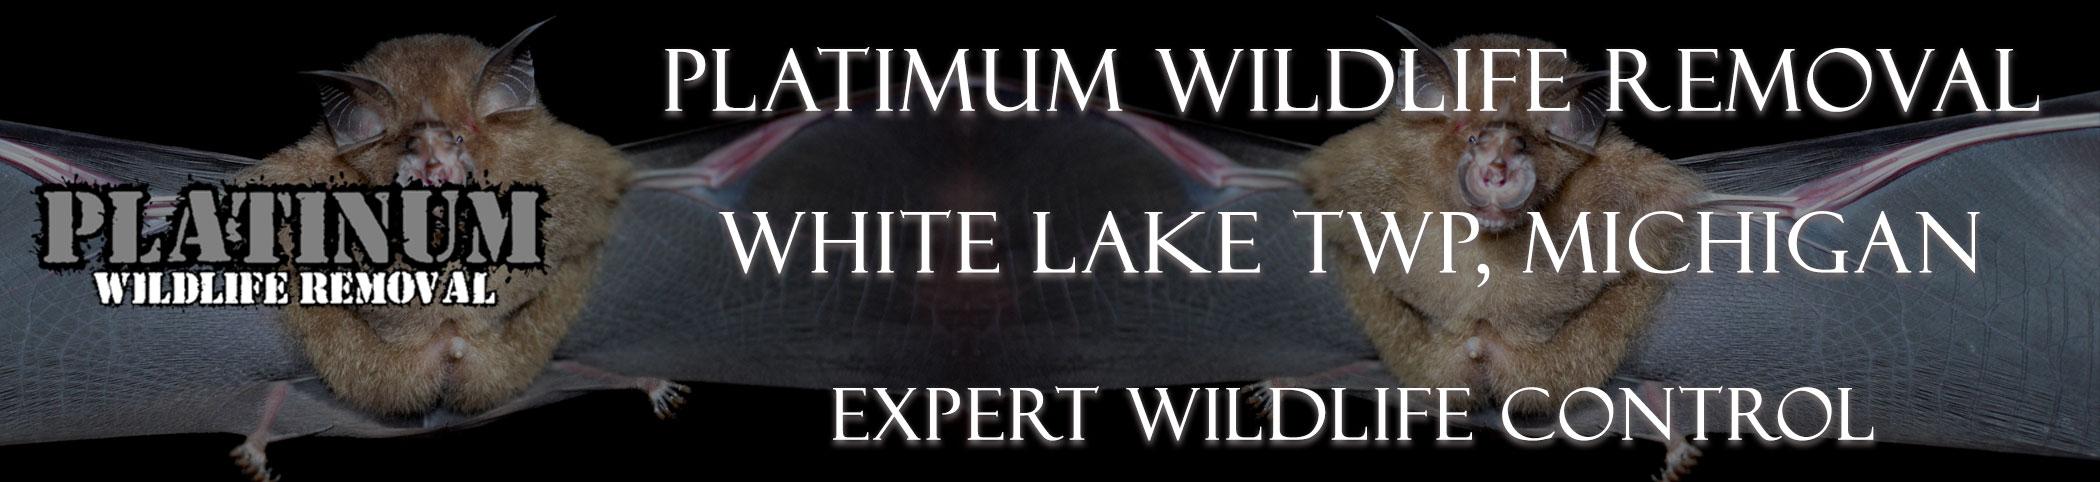 whitelake_twp_mich header image at bat removal pro